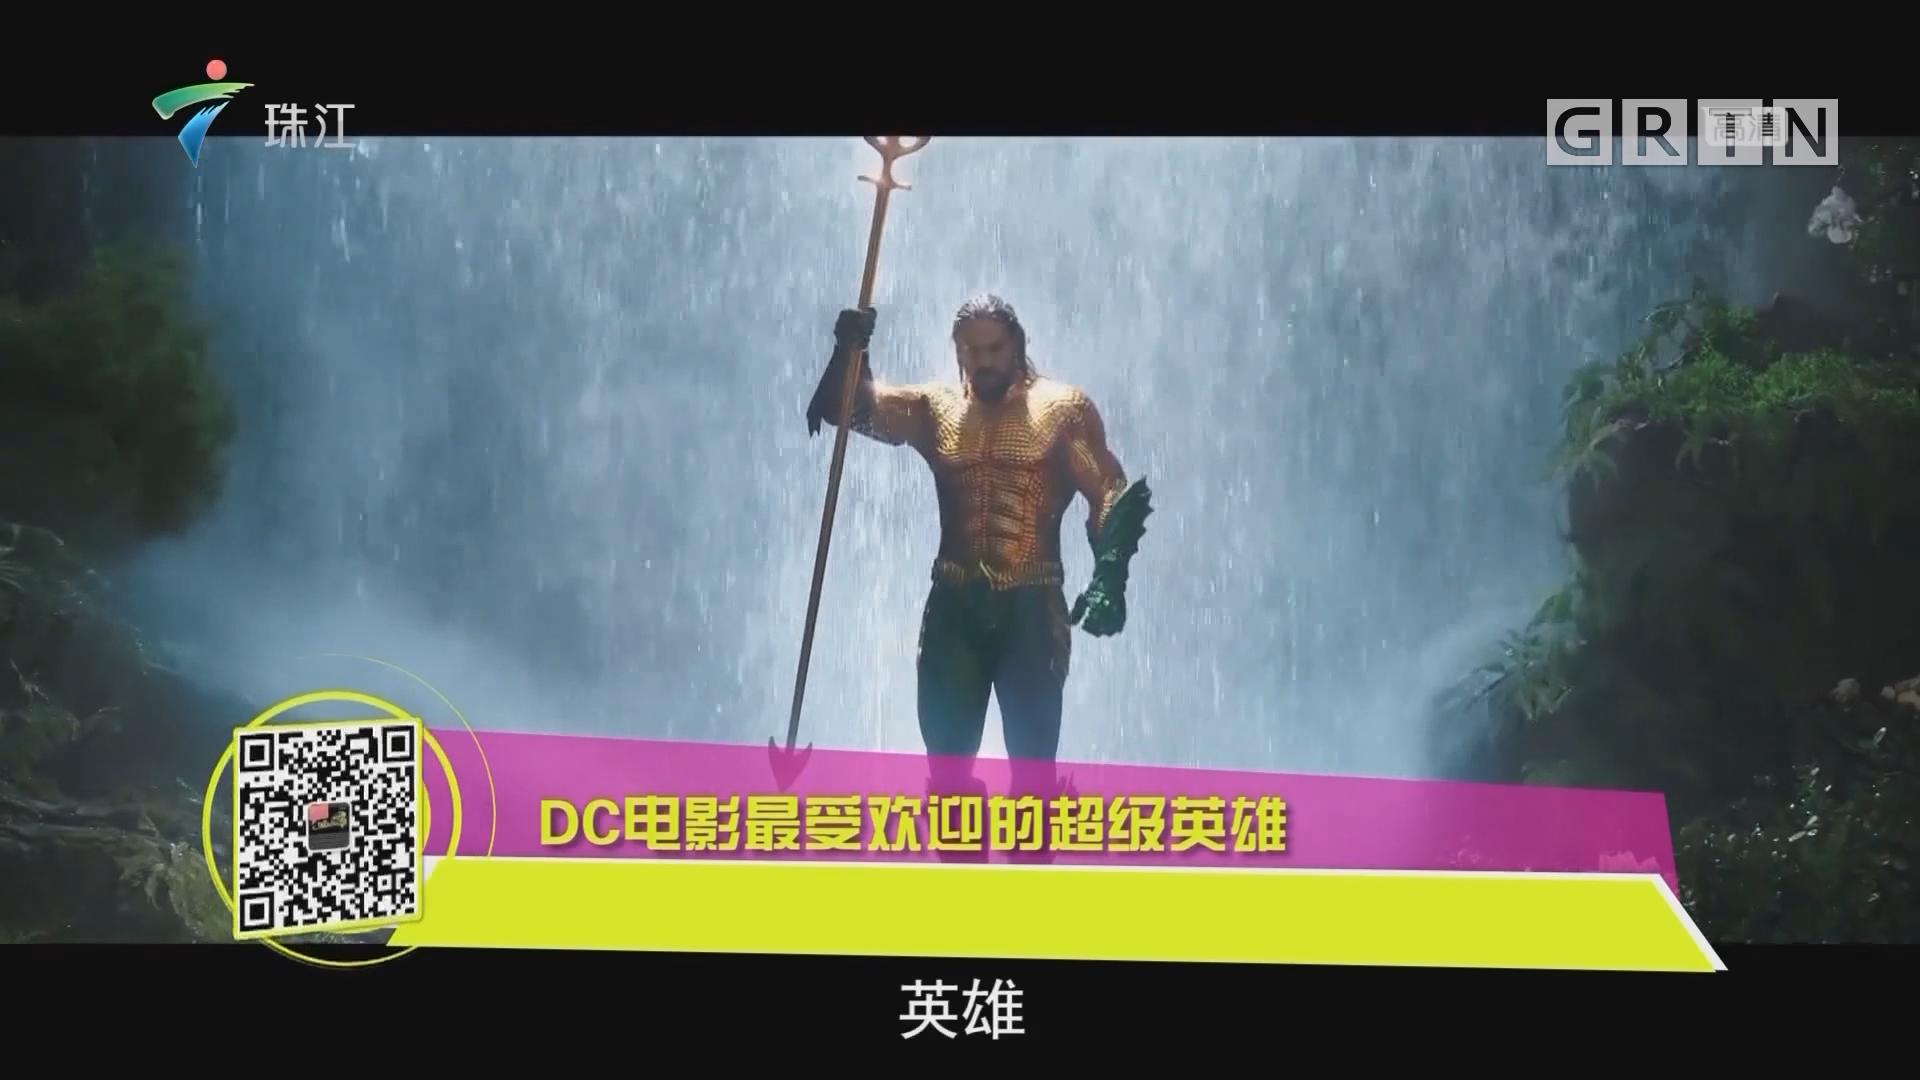 DC电影最受欢迎的超级英雄